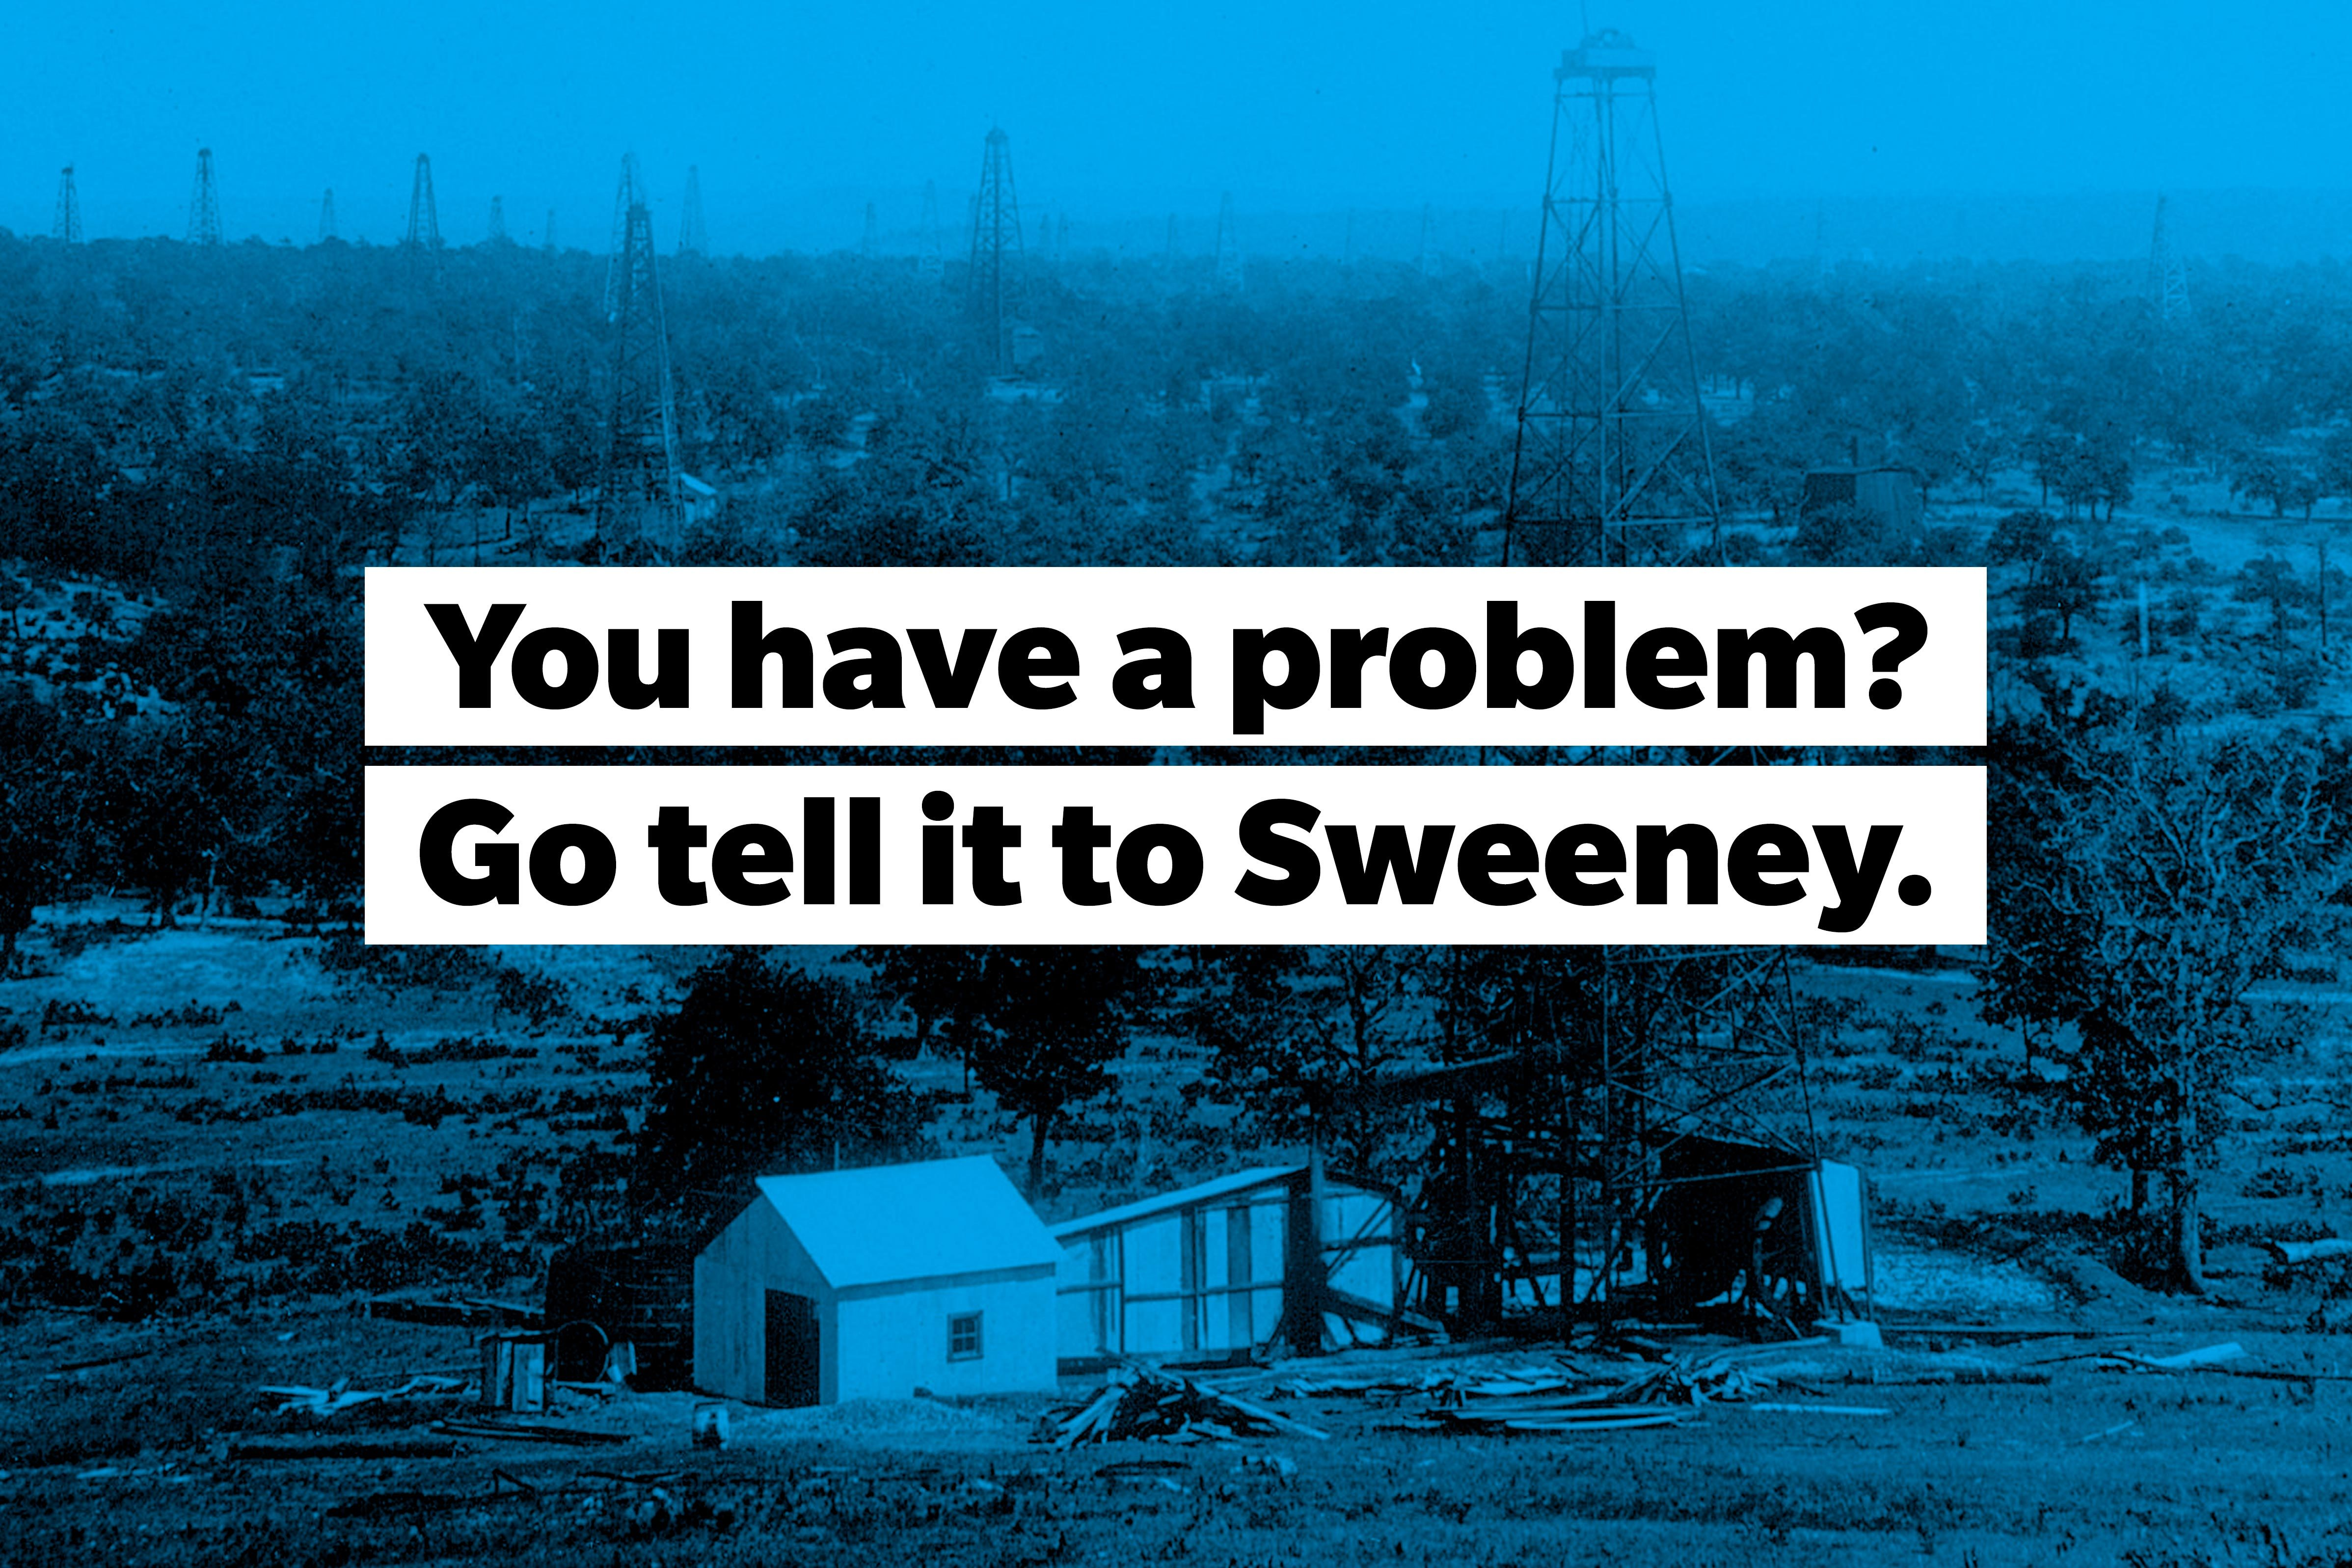 slang words Tell it to Sweeney